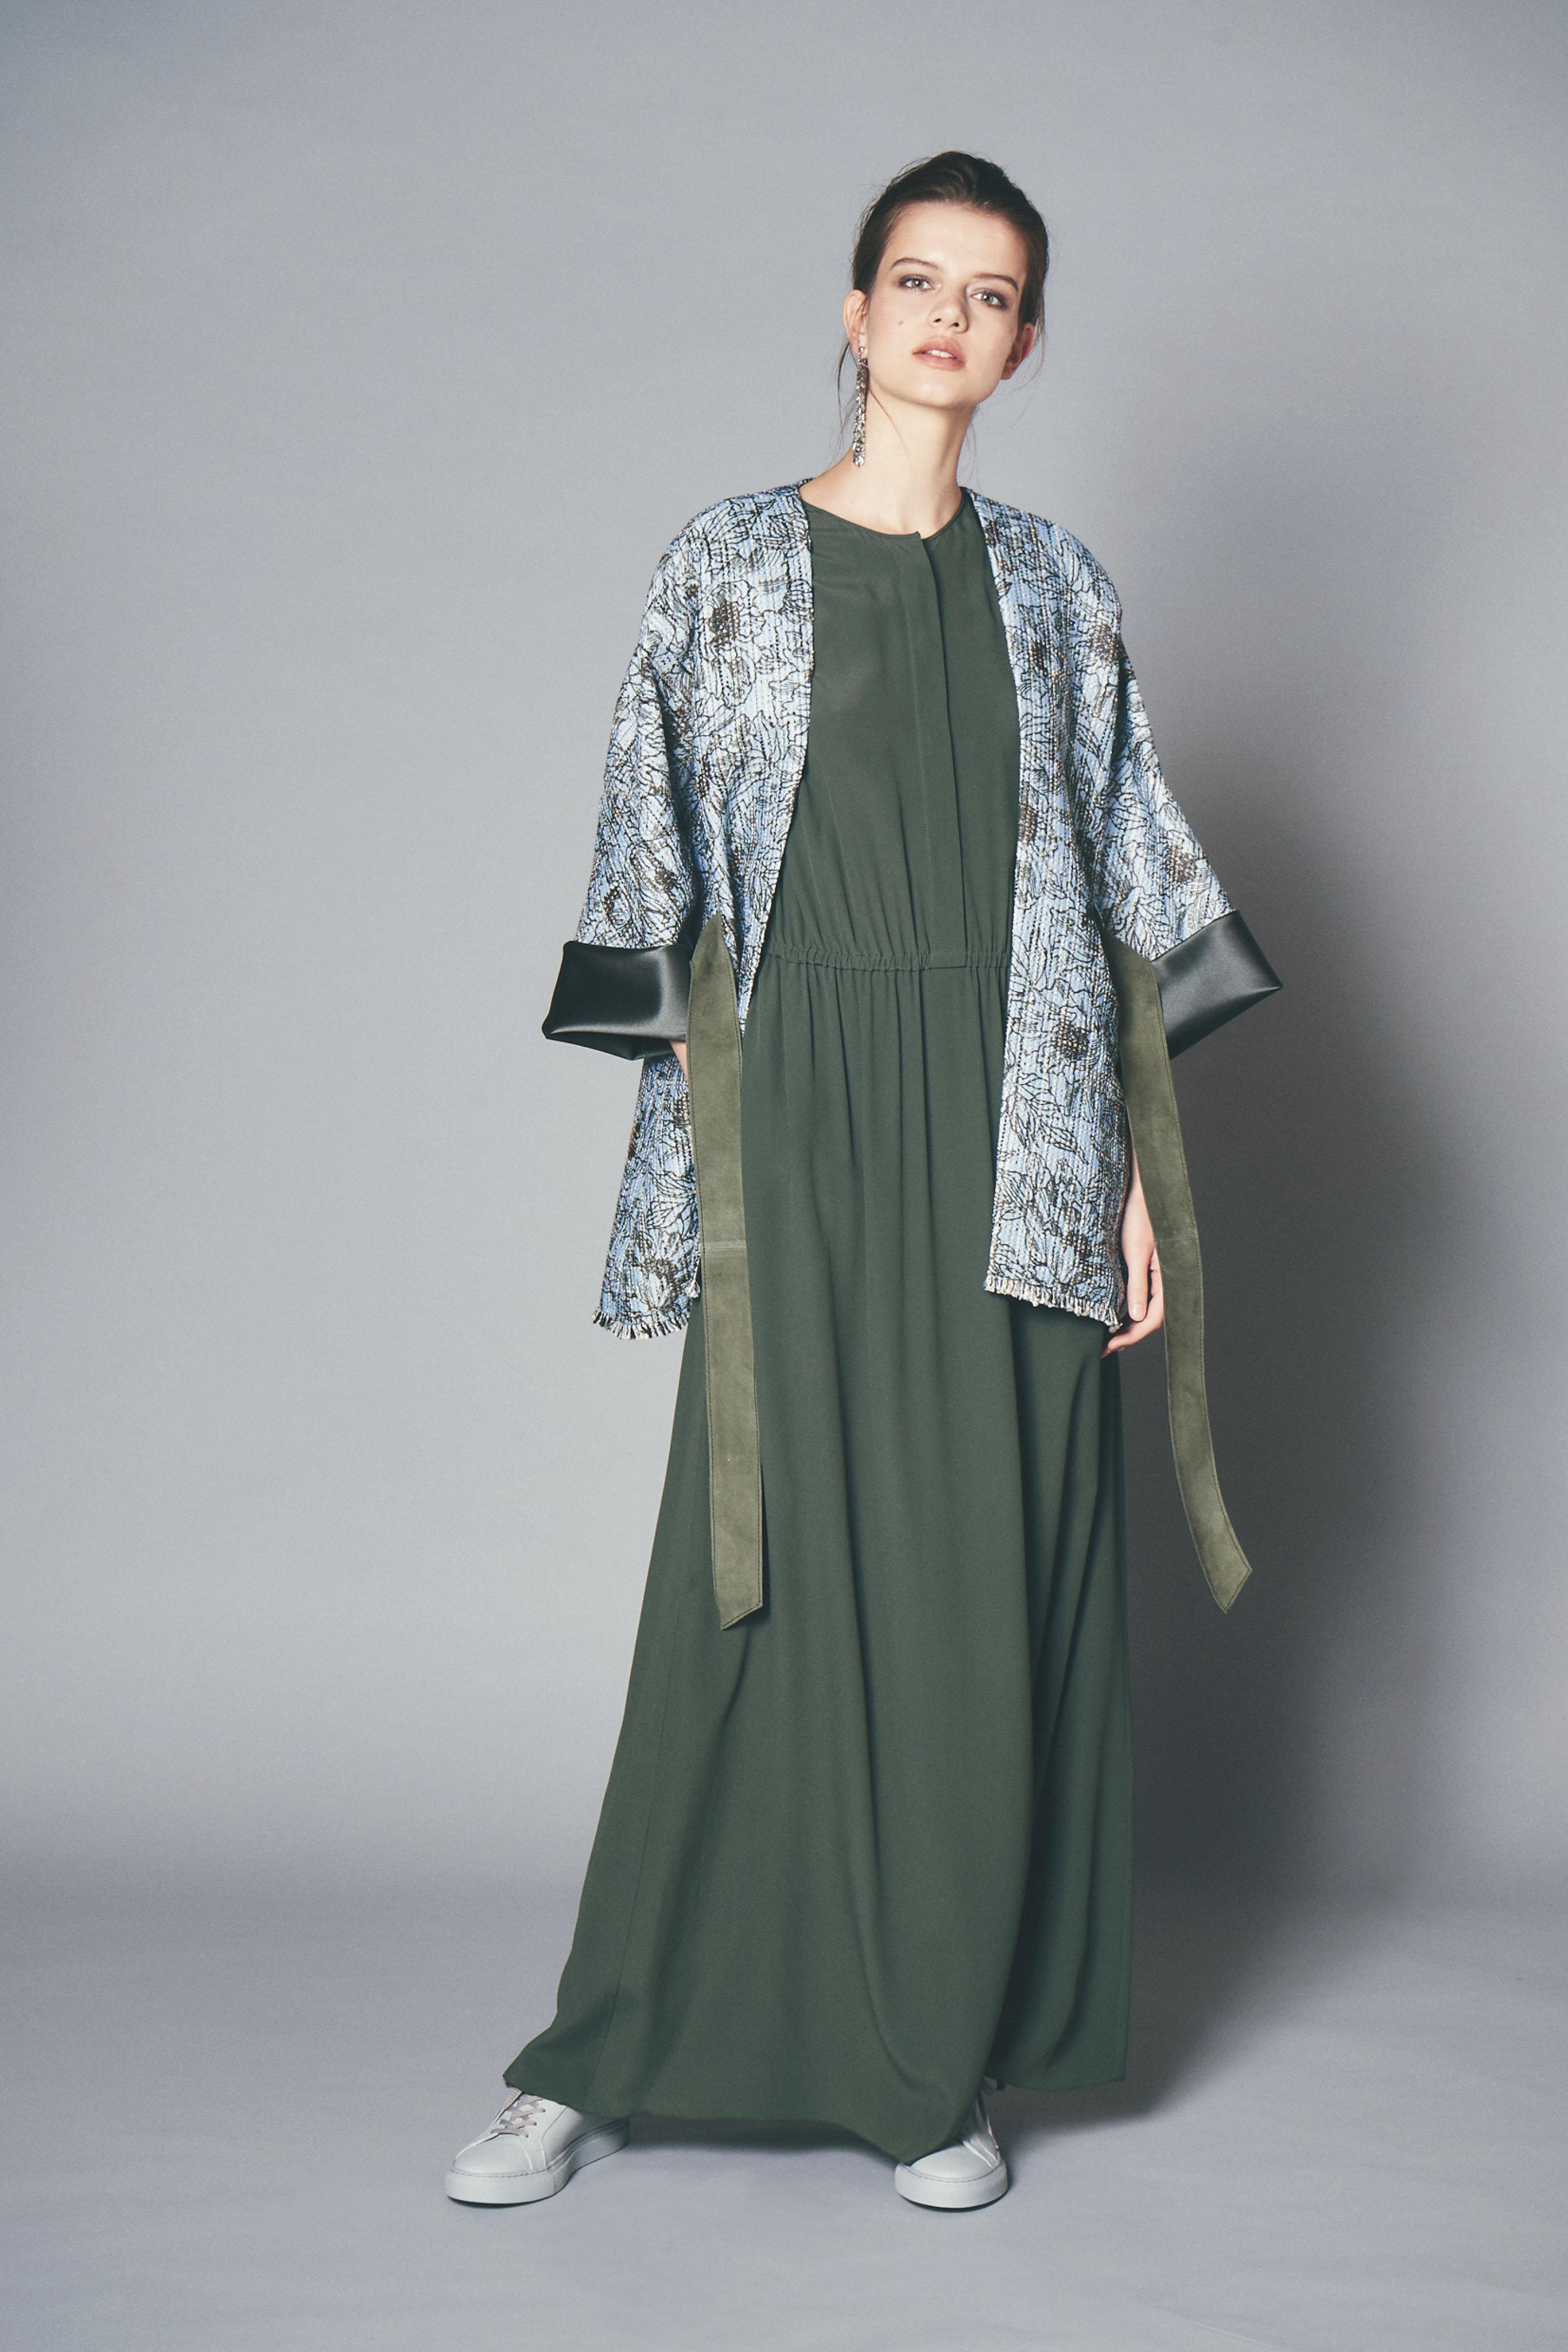 Les Copains pre collezione 2020